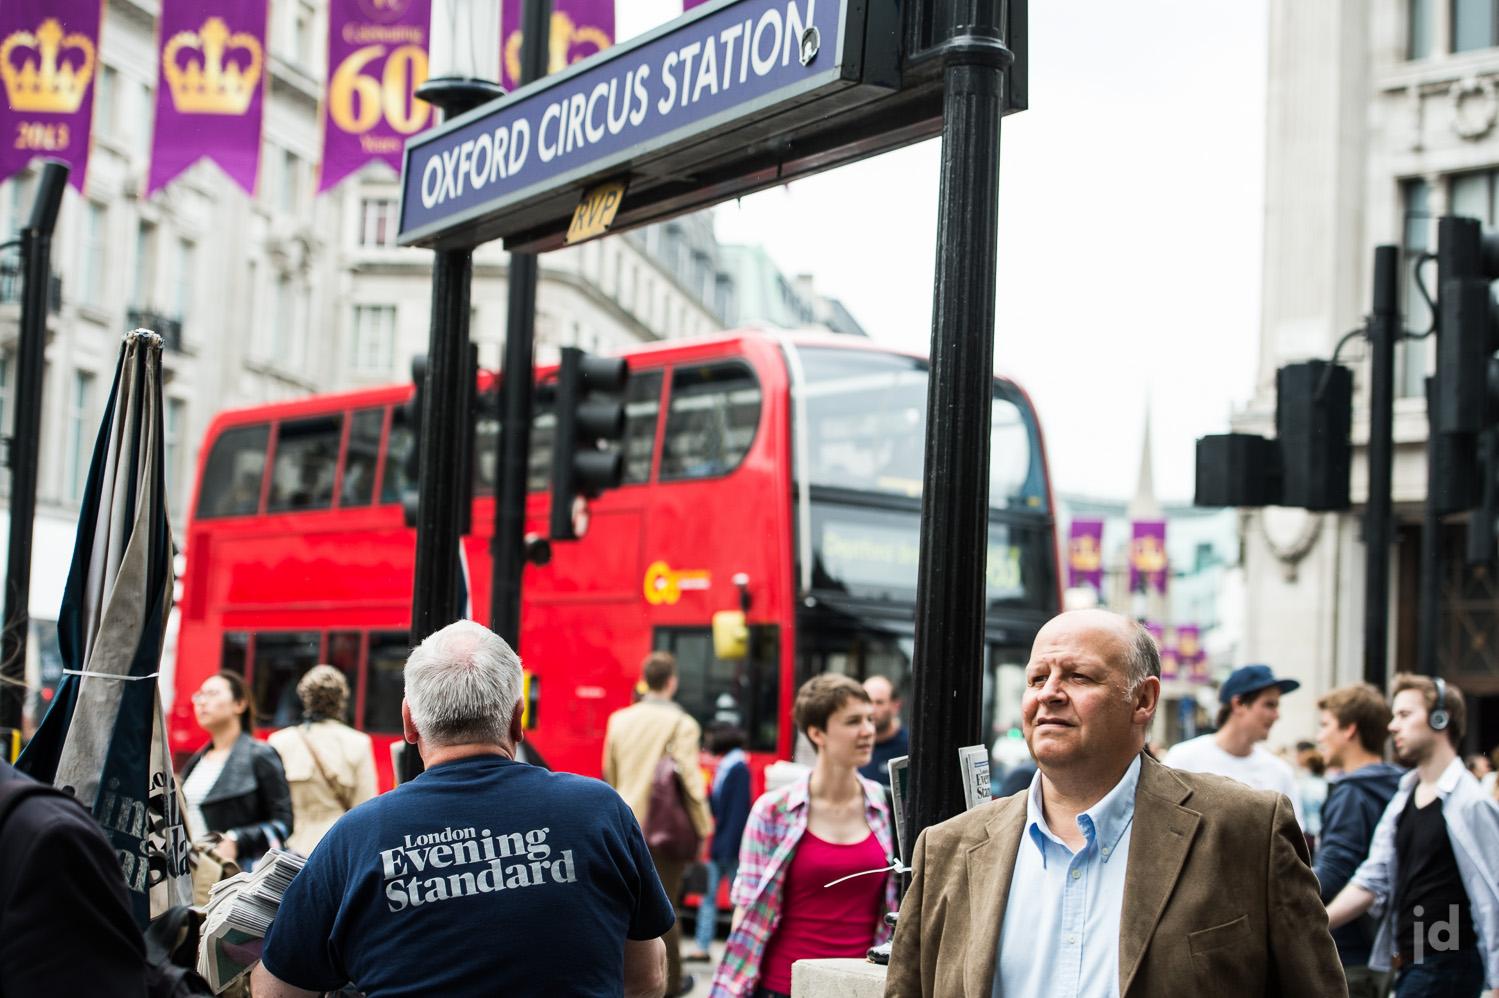 London_Photography_Jason_Davis_Images_001-5.jpg